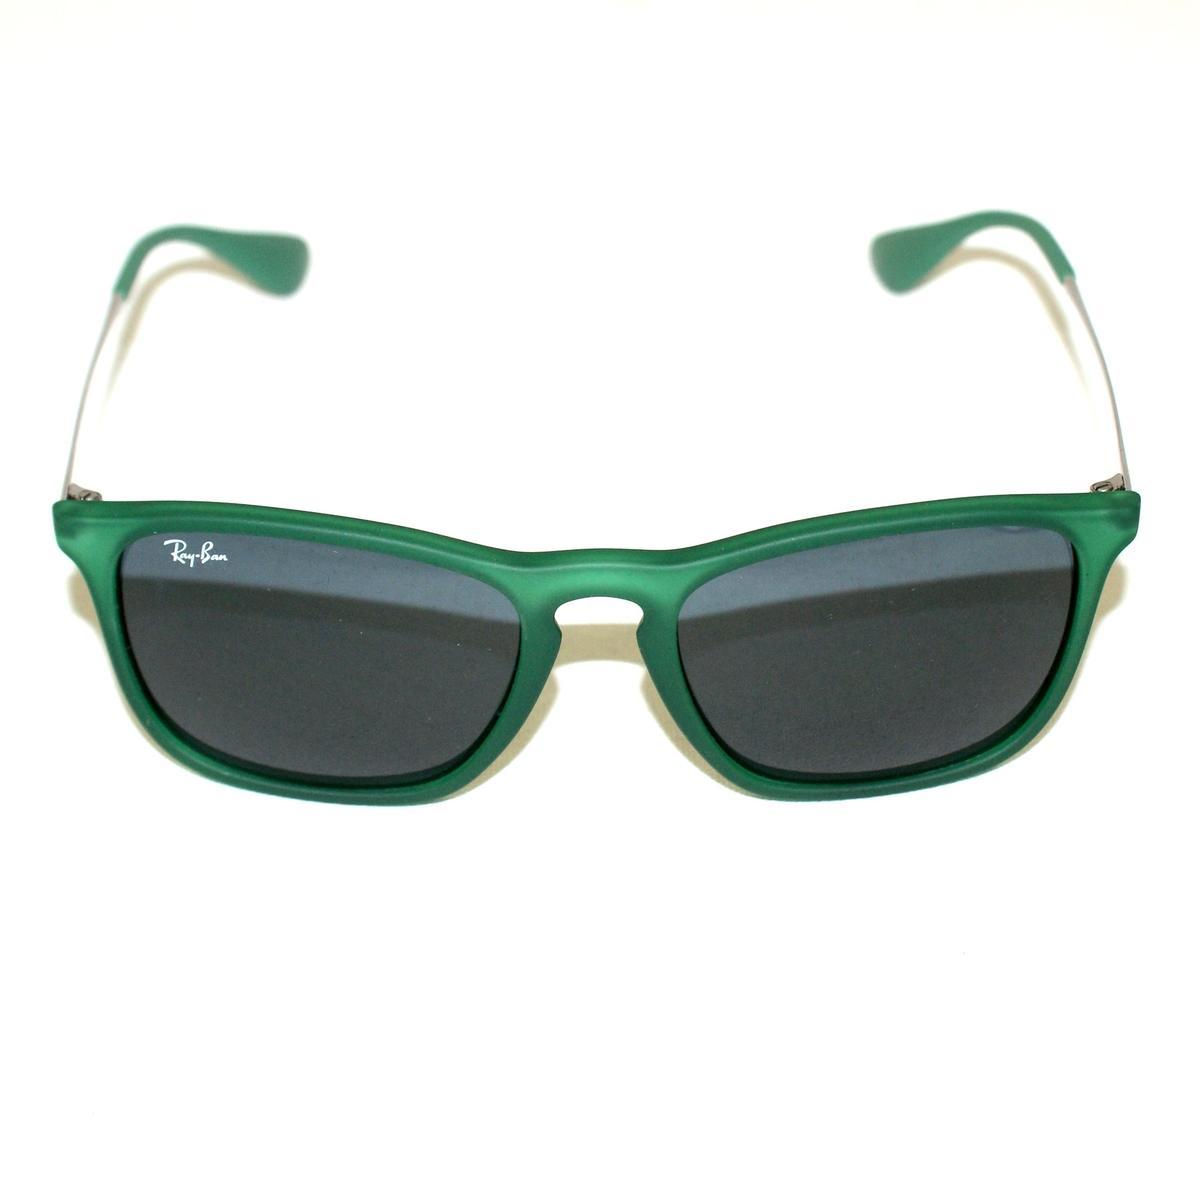 0118524b6ae ... LIGHT HAVANA Frame BROWN GRADIENT Lenses 55mm Non-Polarized Sunglasses  Ray Ban Green 56496